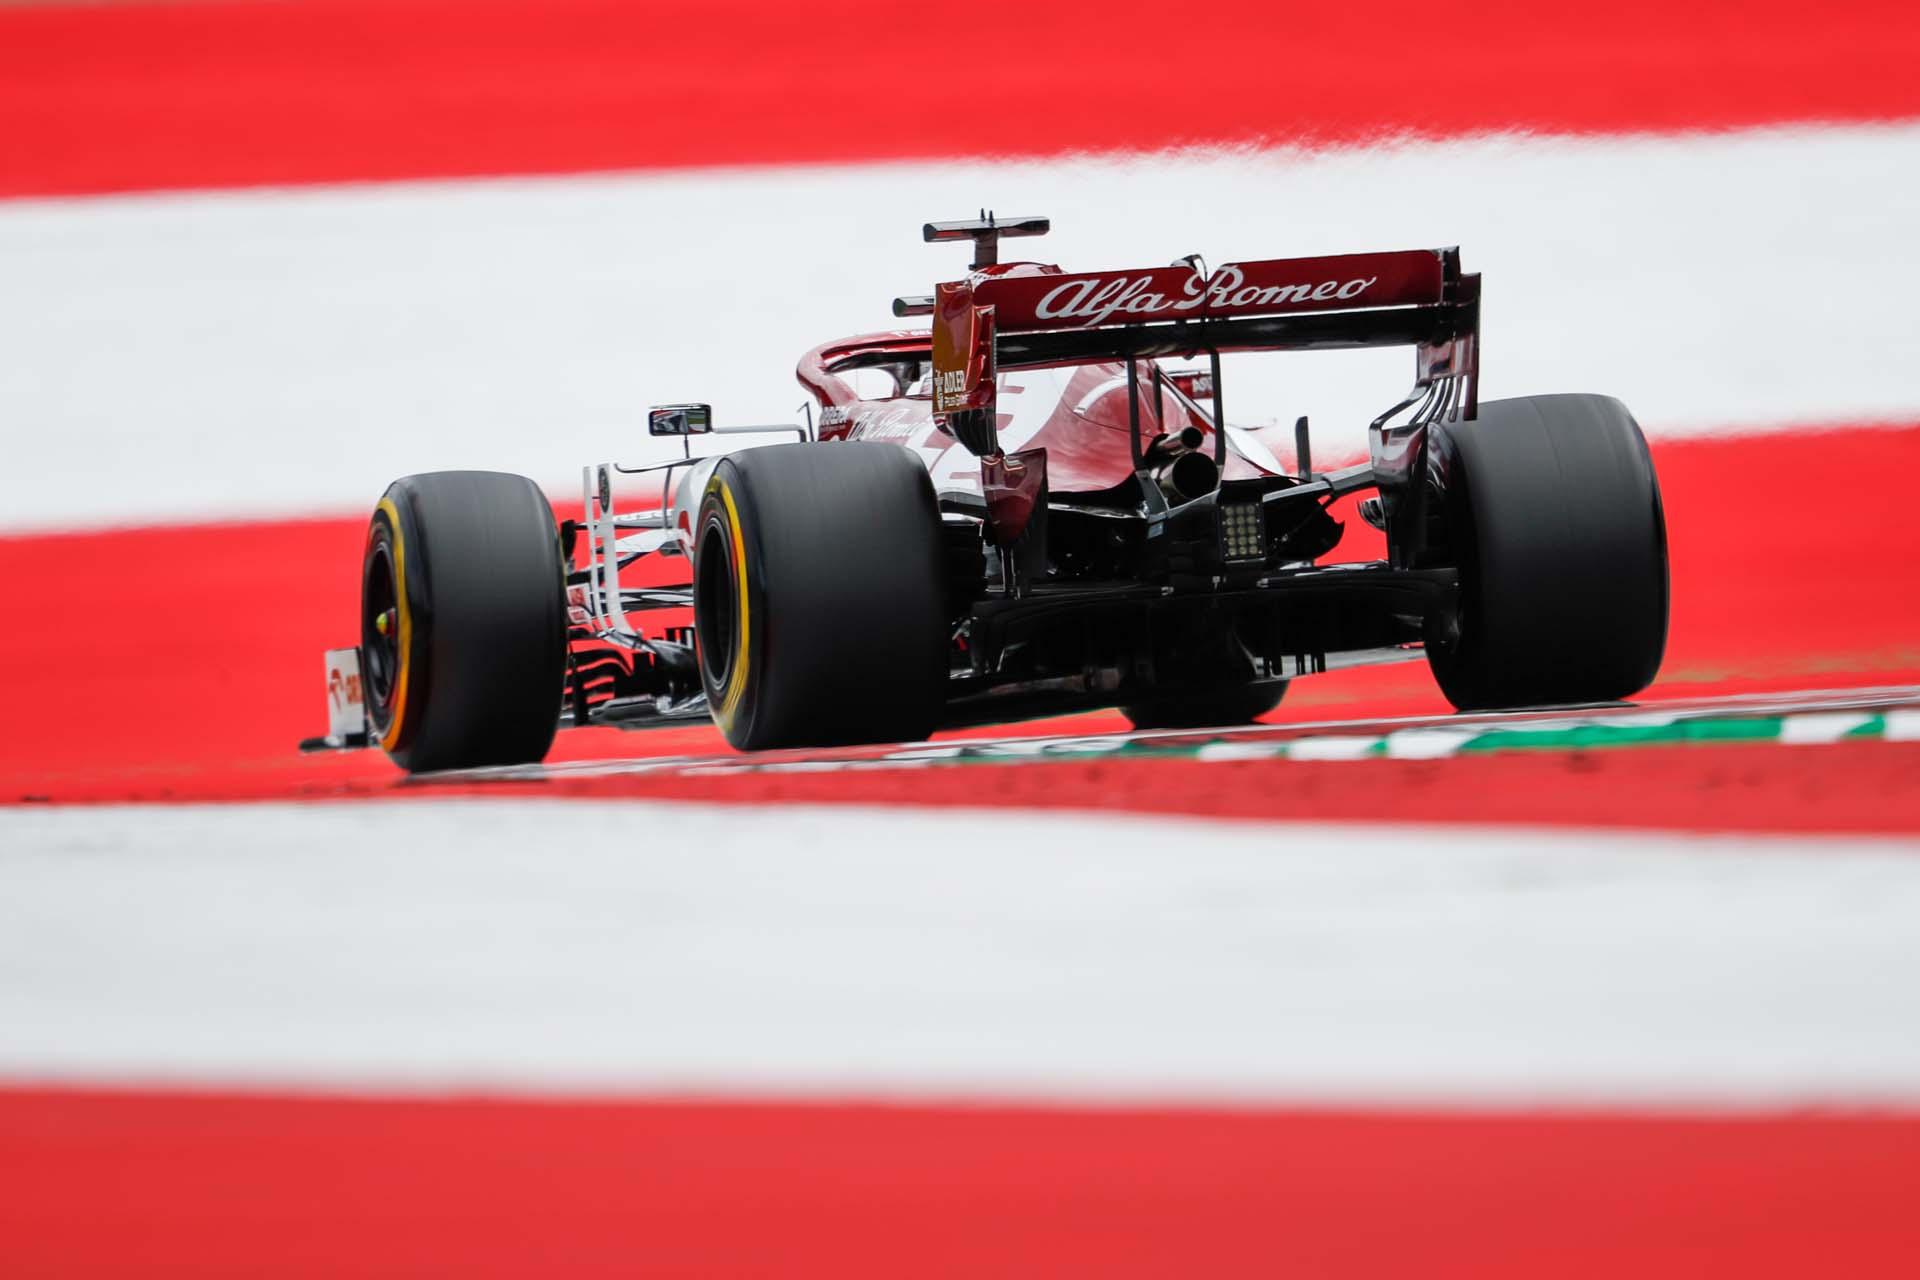 F1 - AUSTRIAN GRAND PRIX 2020